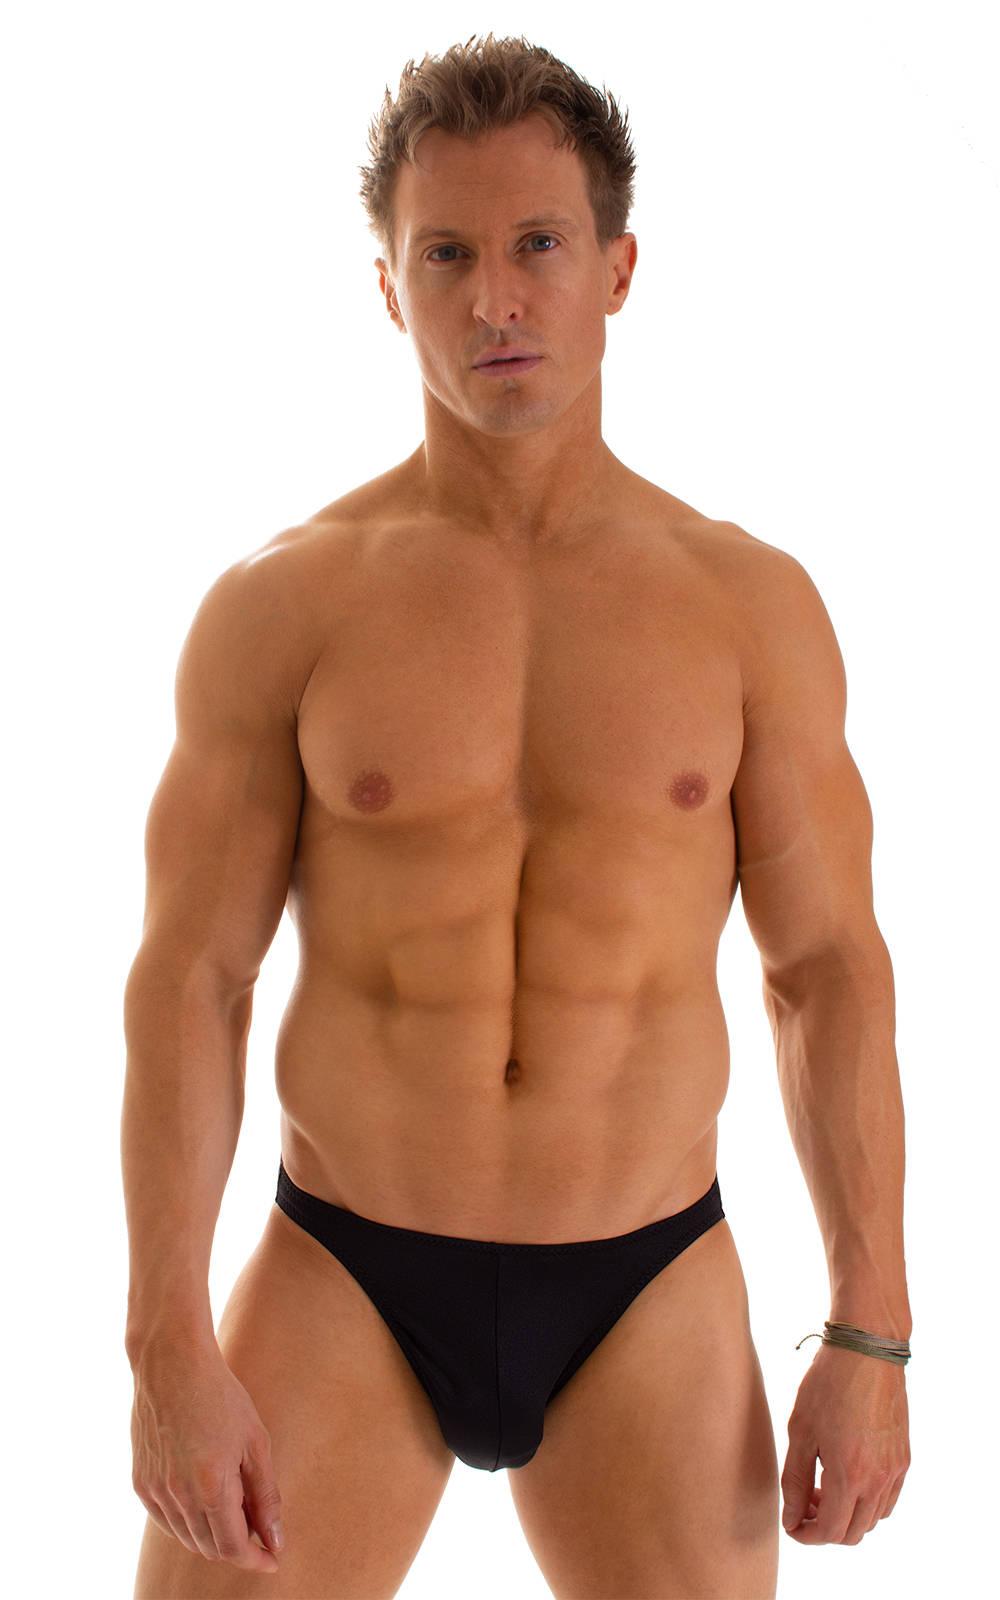 Bikini-Brief Swimsuit in Black 1